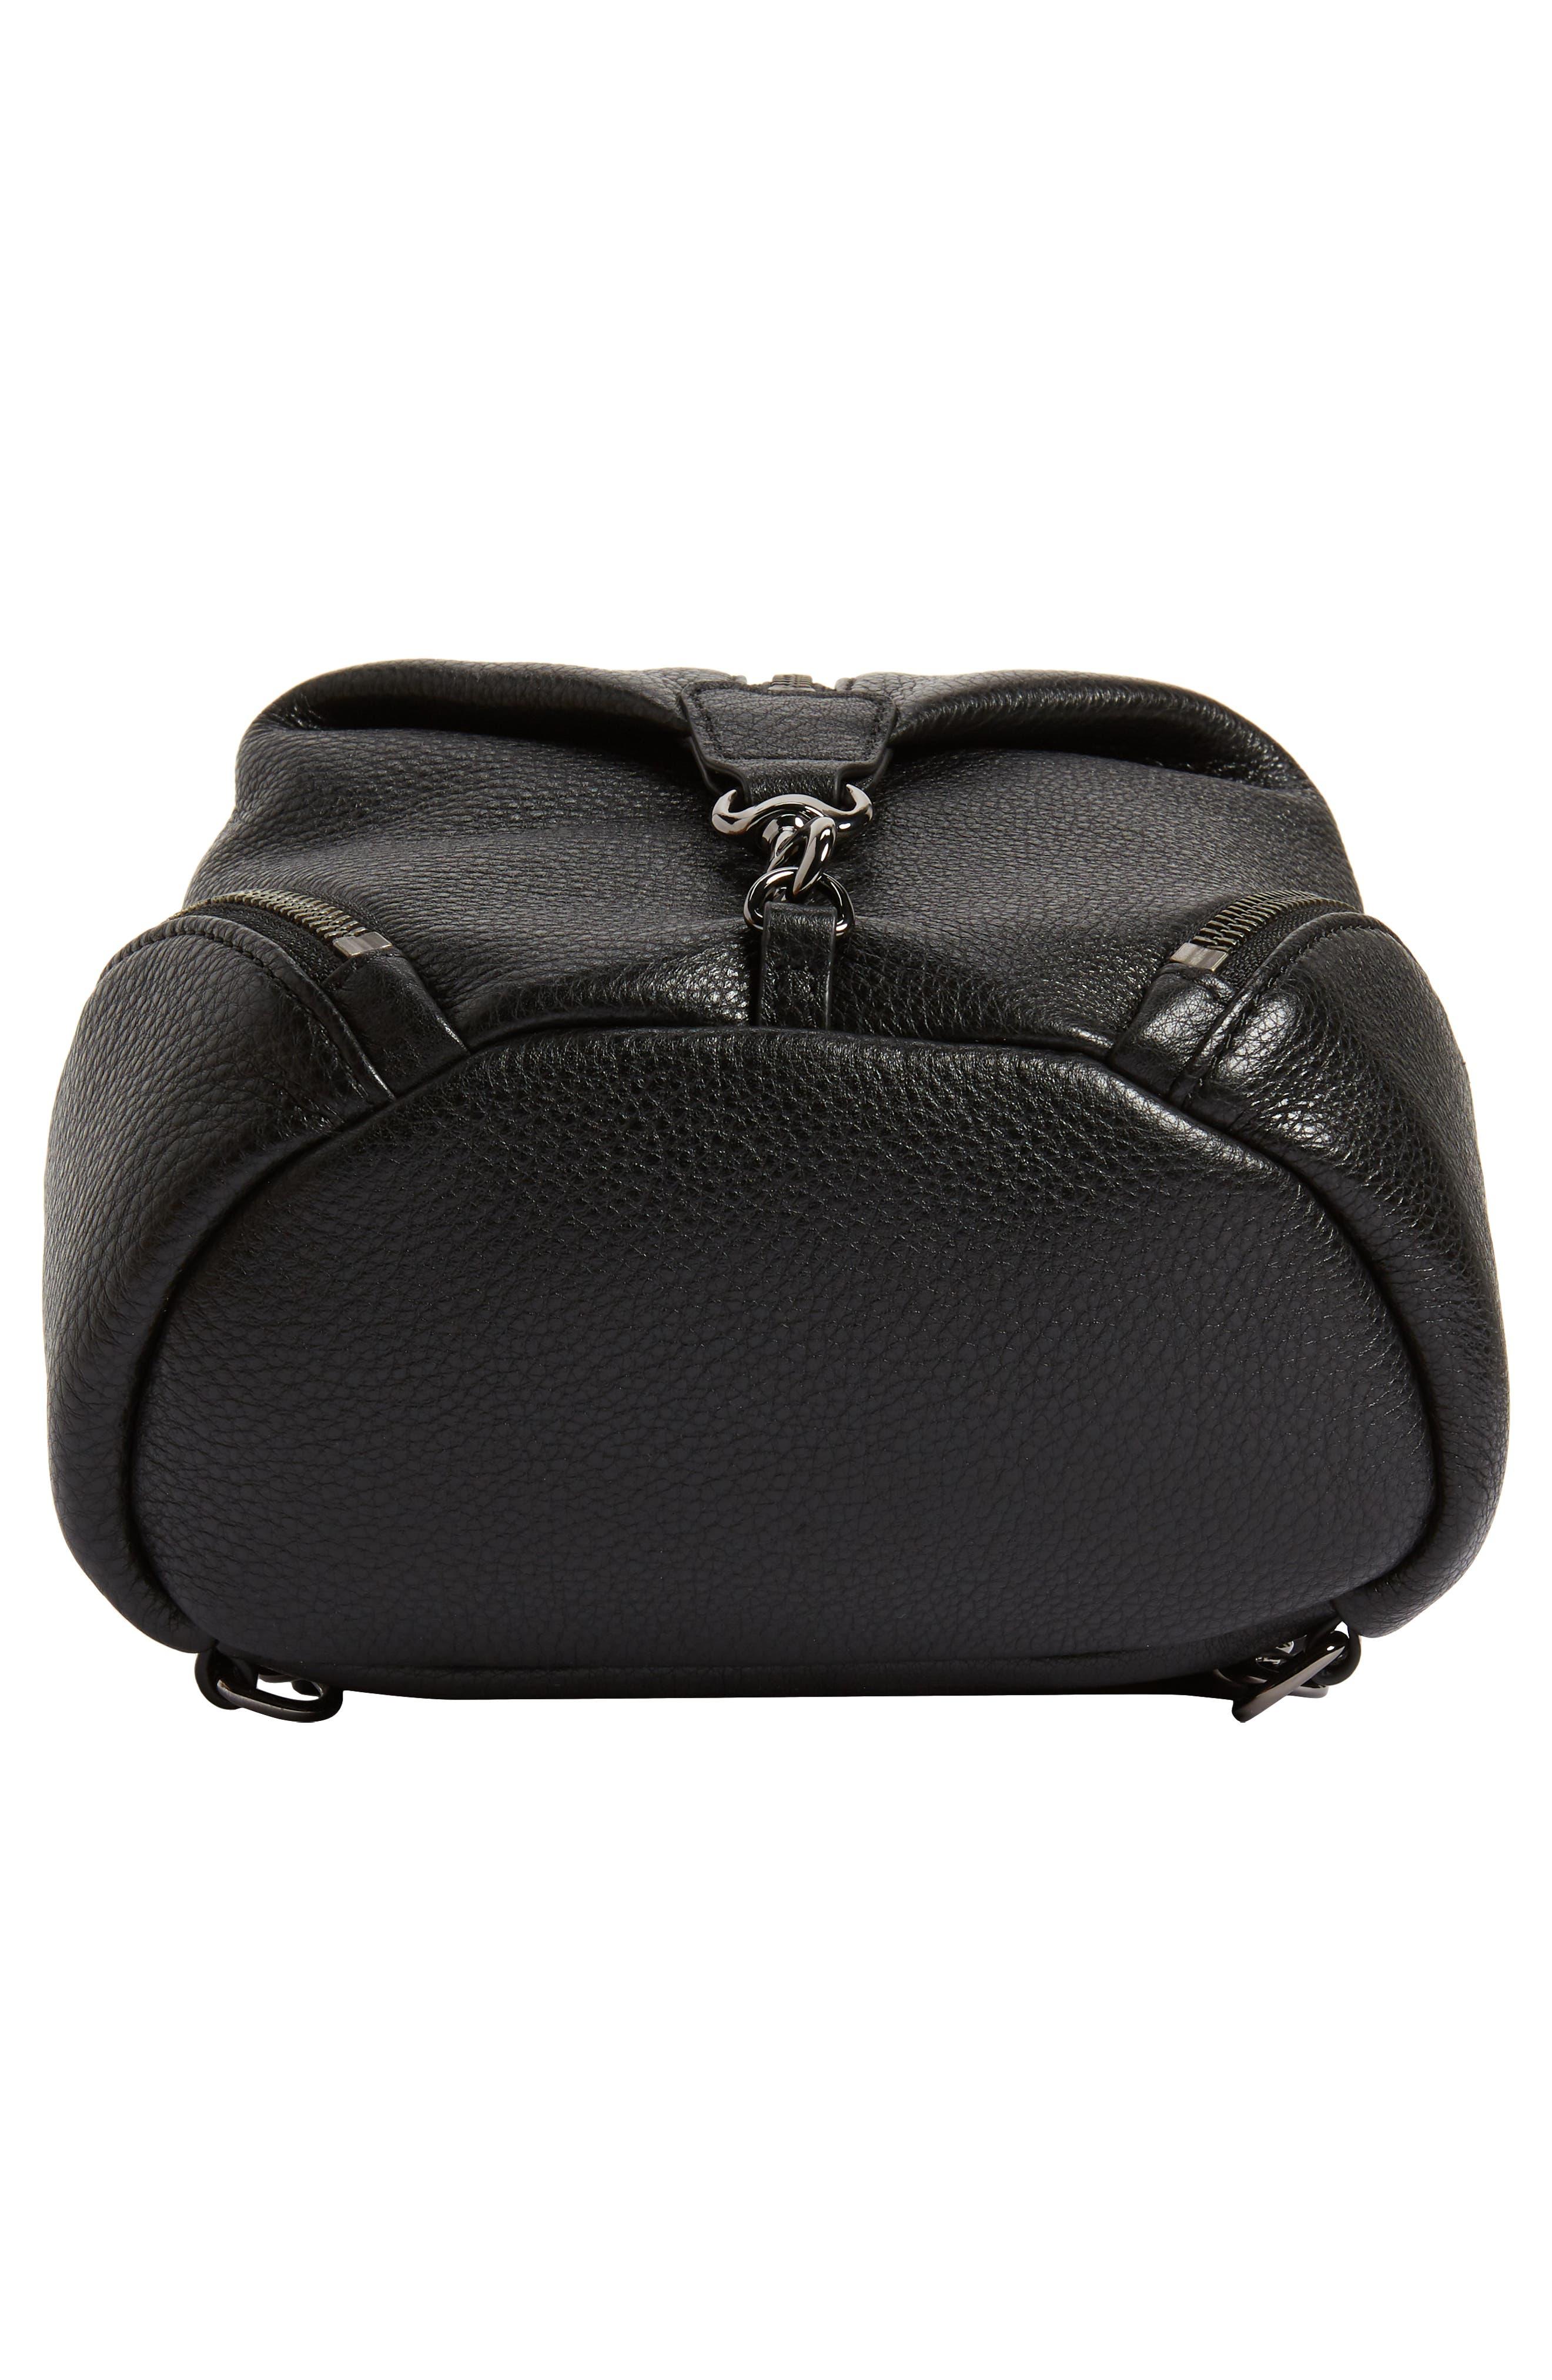 REBECCA MINKOFF, Mini Julian Pebbled Leather Convertible Backpack, Alternate thumbnail 8, color, BLACK